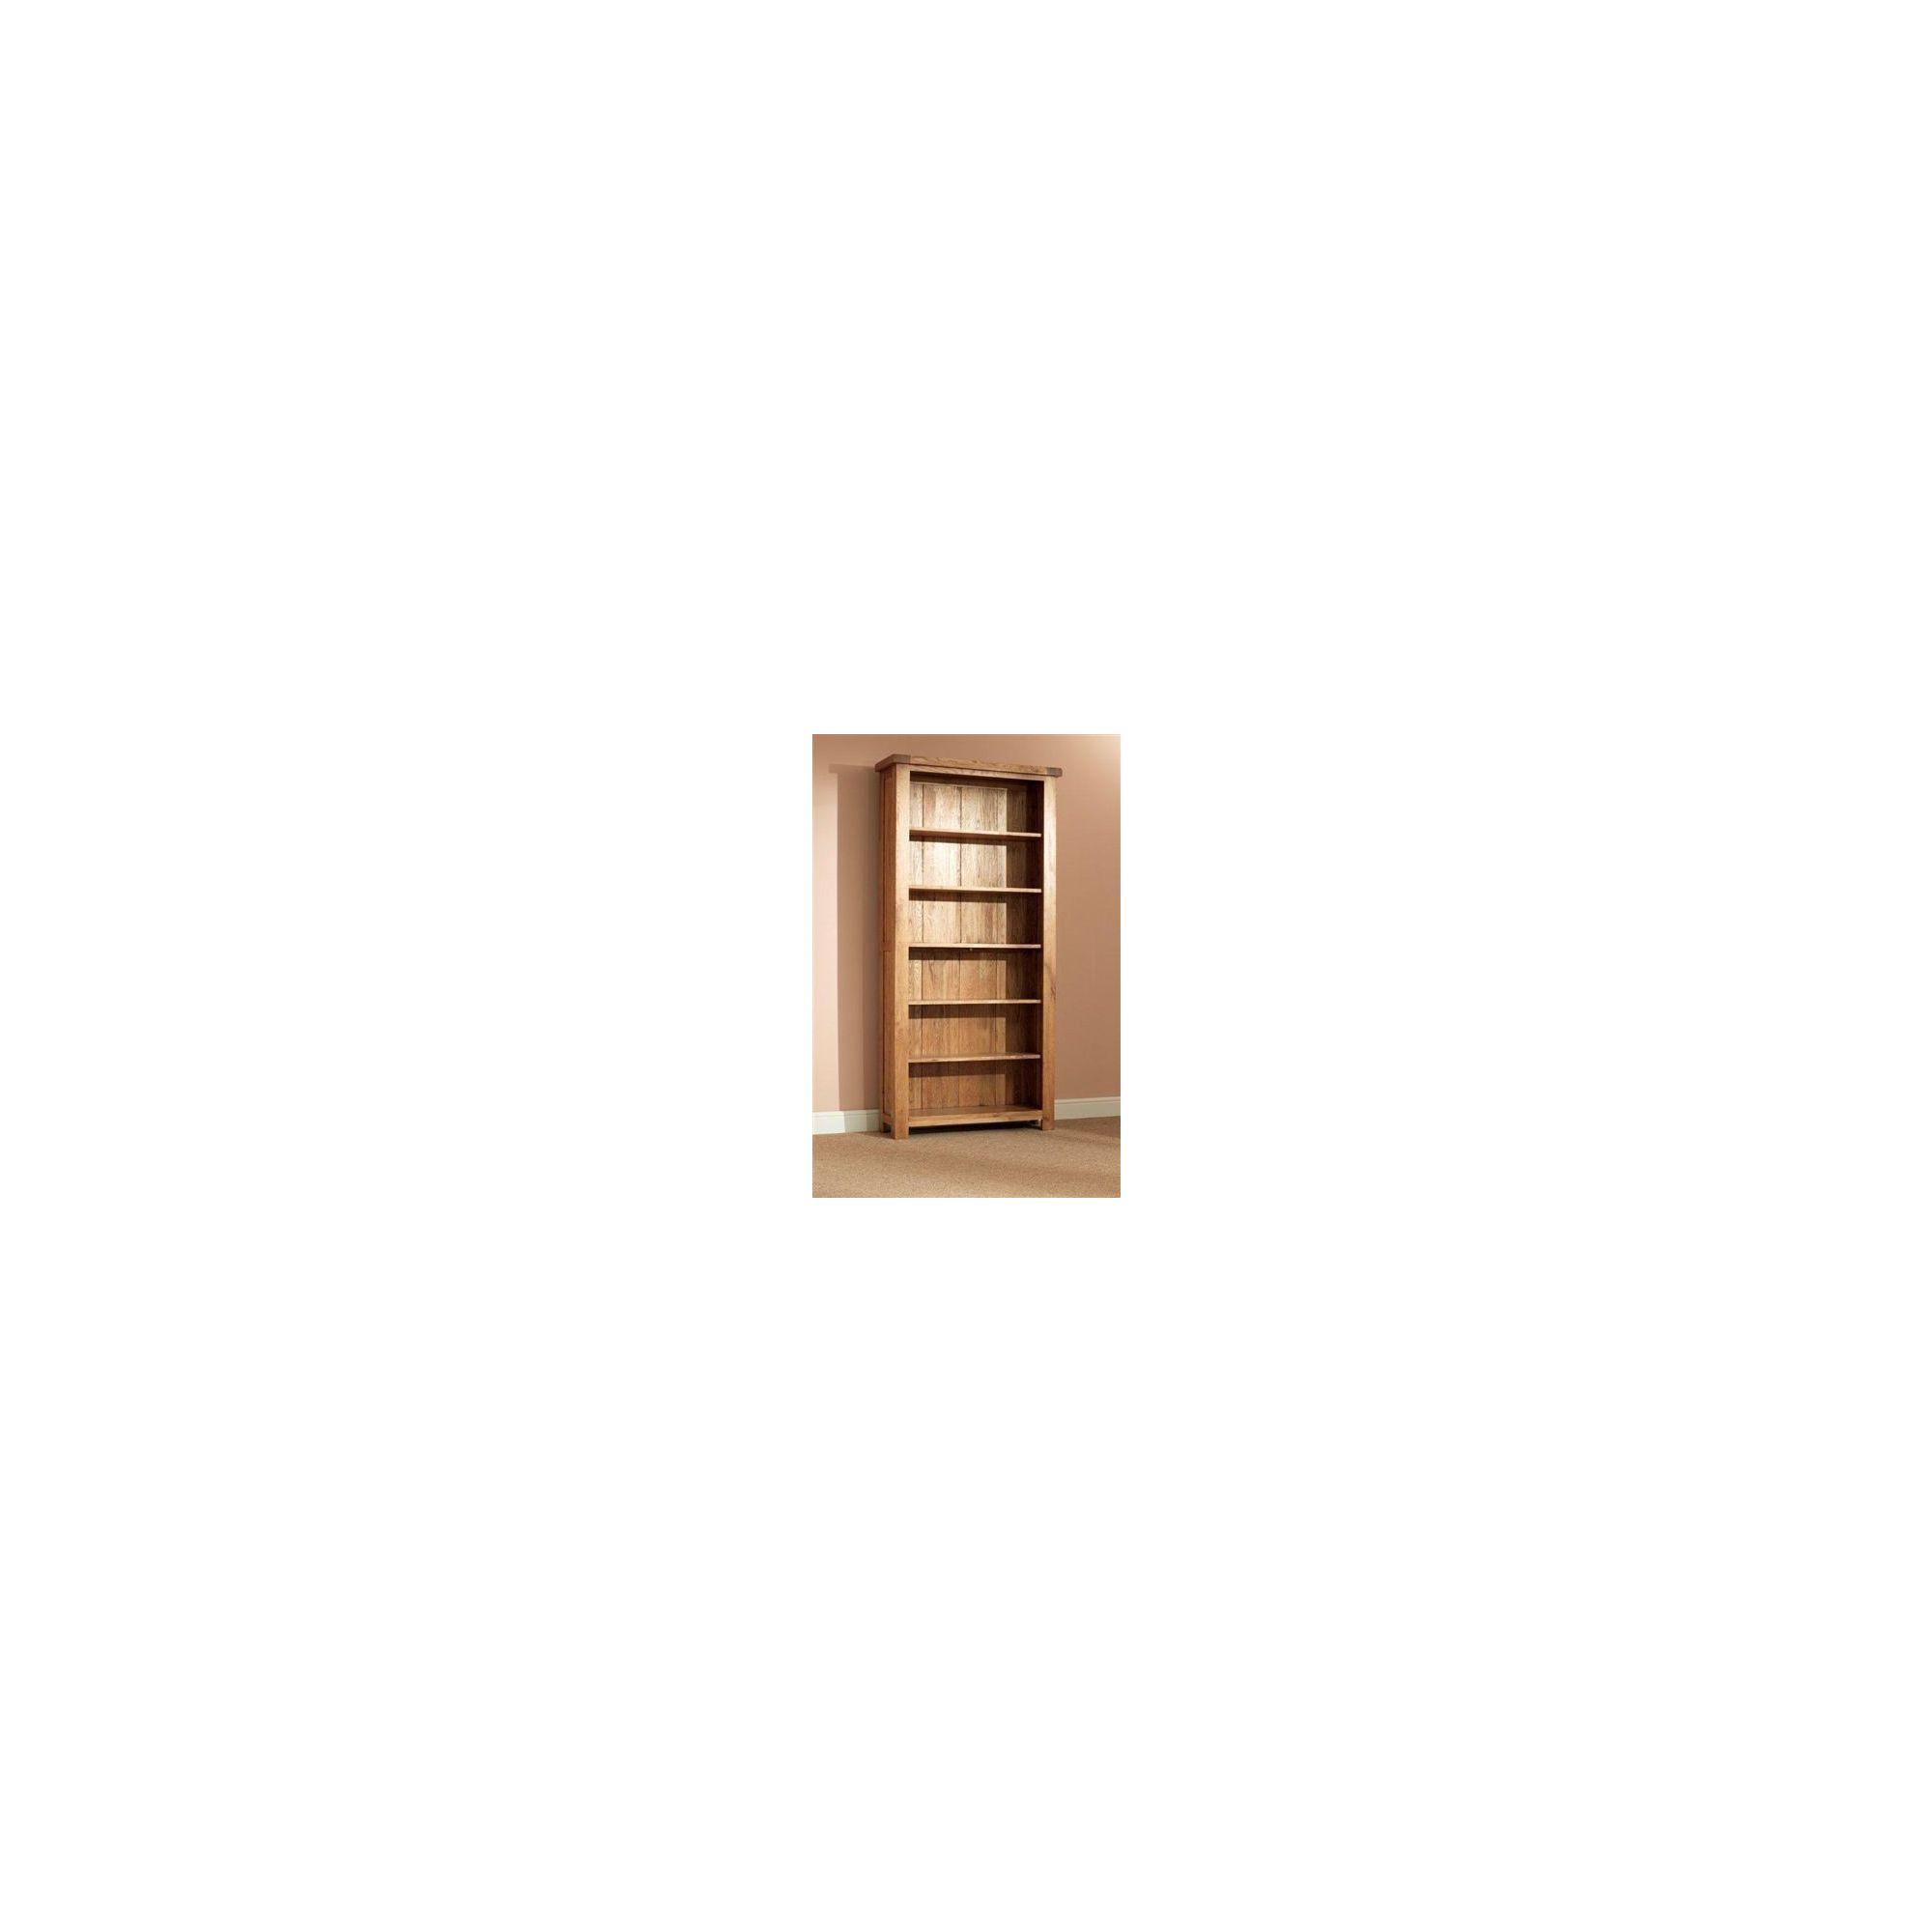 Sleepy Valley Buckingham 6 Shelf Bookcase at Tesco Direct